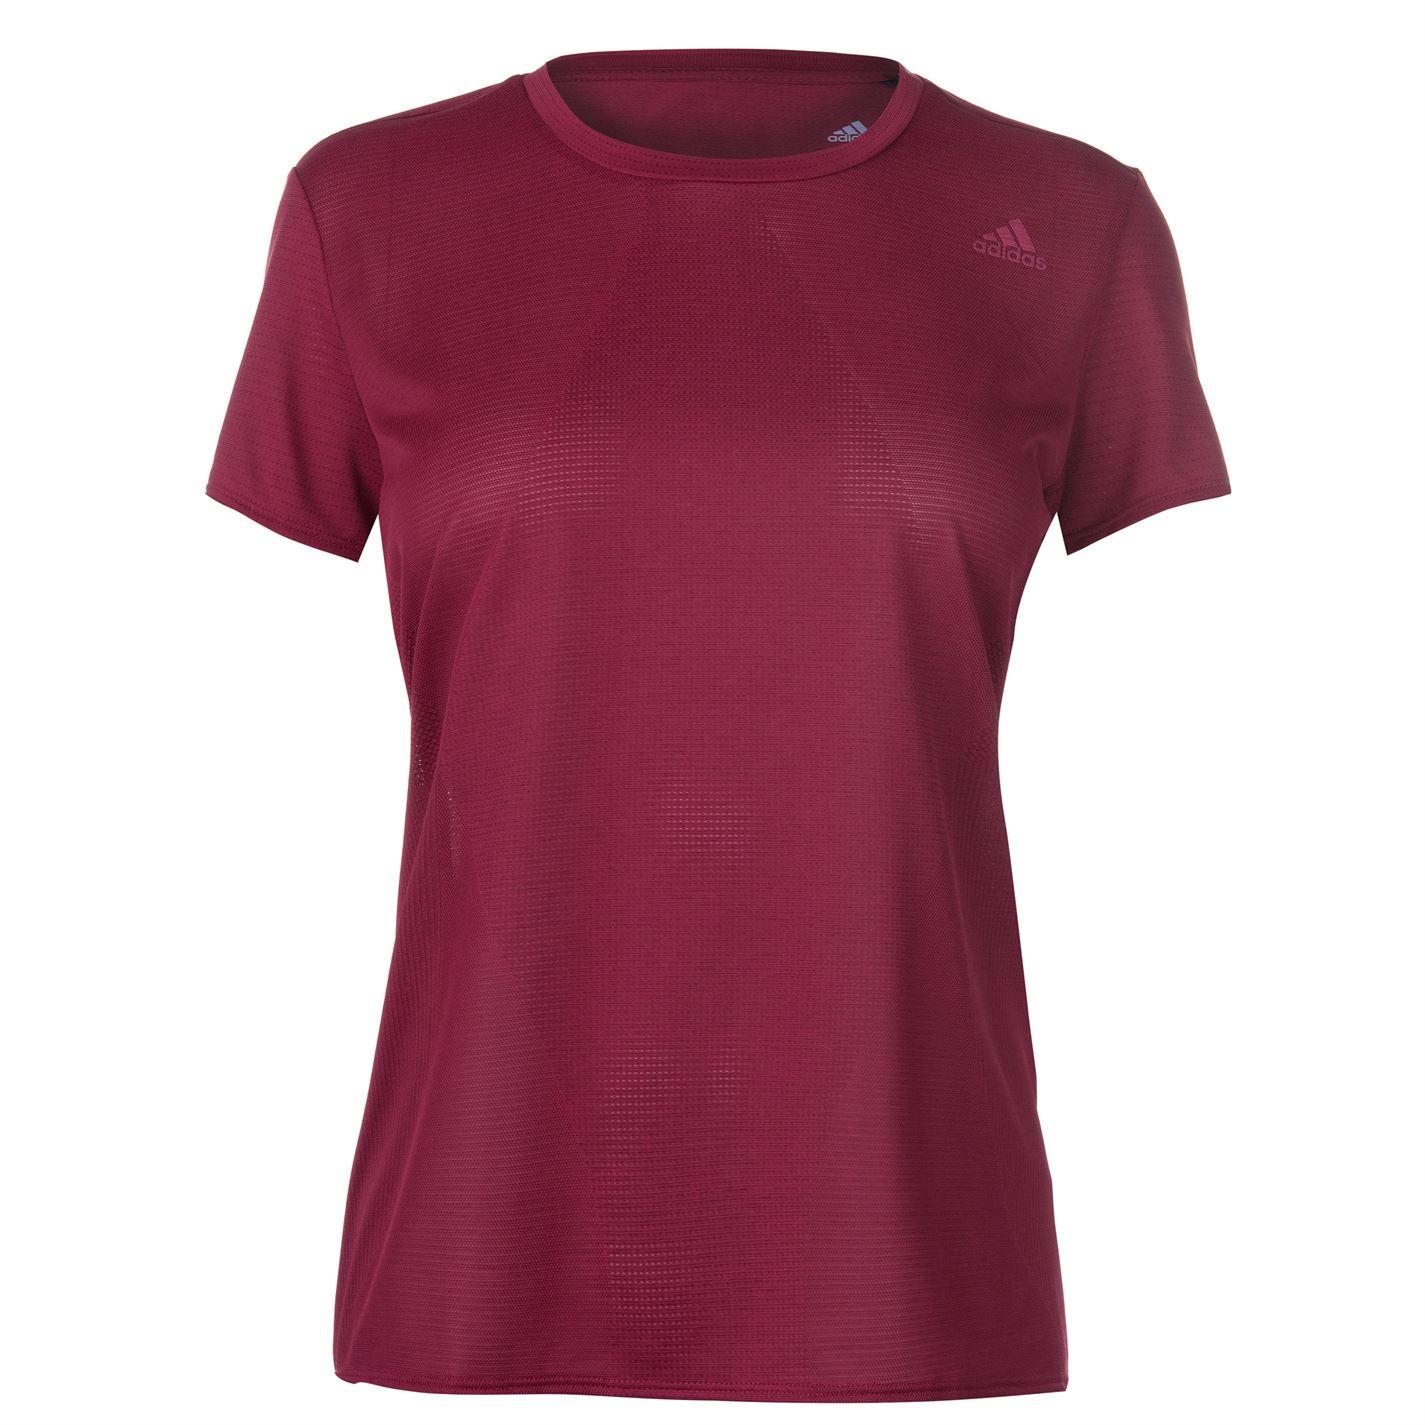 Adidas Supernova Short Sleeve T Shirt Ladies